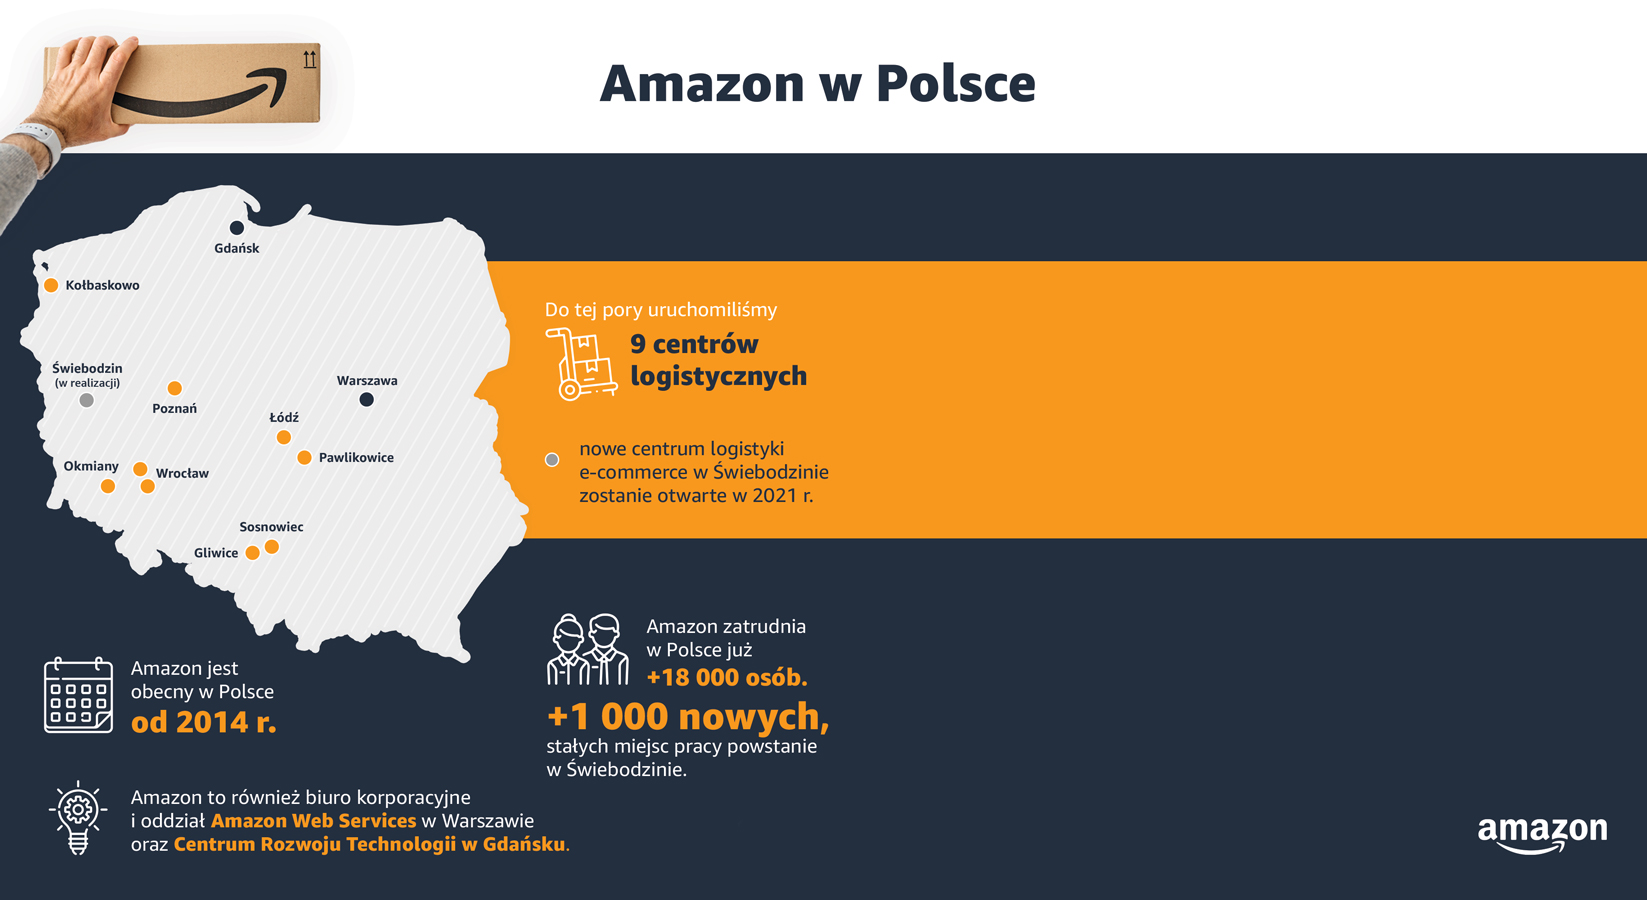 infografika o amazon w polsce